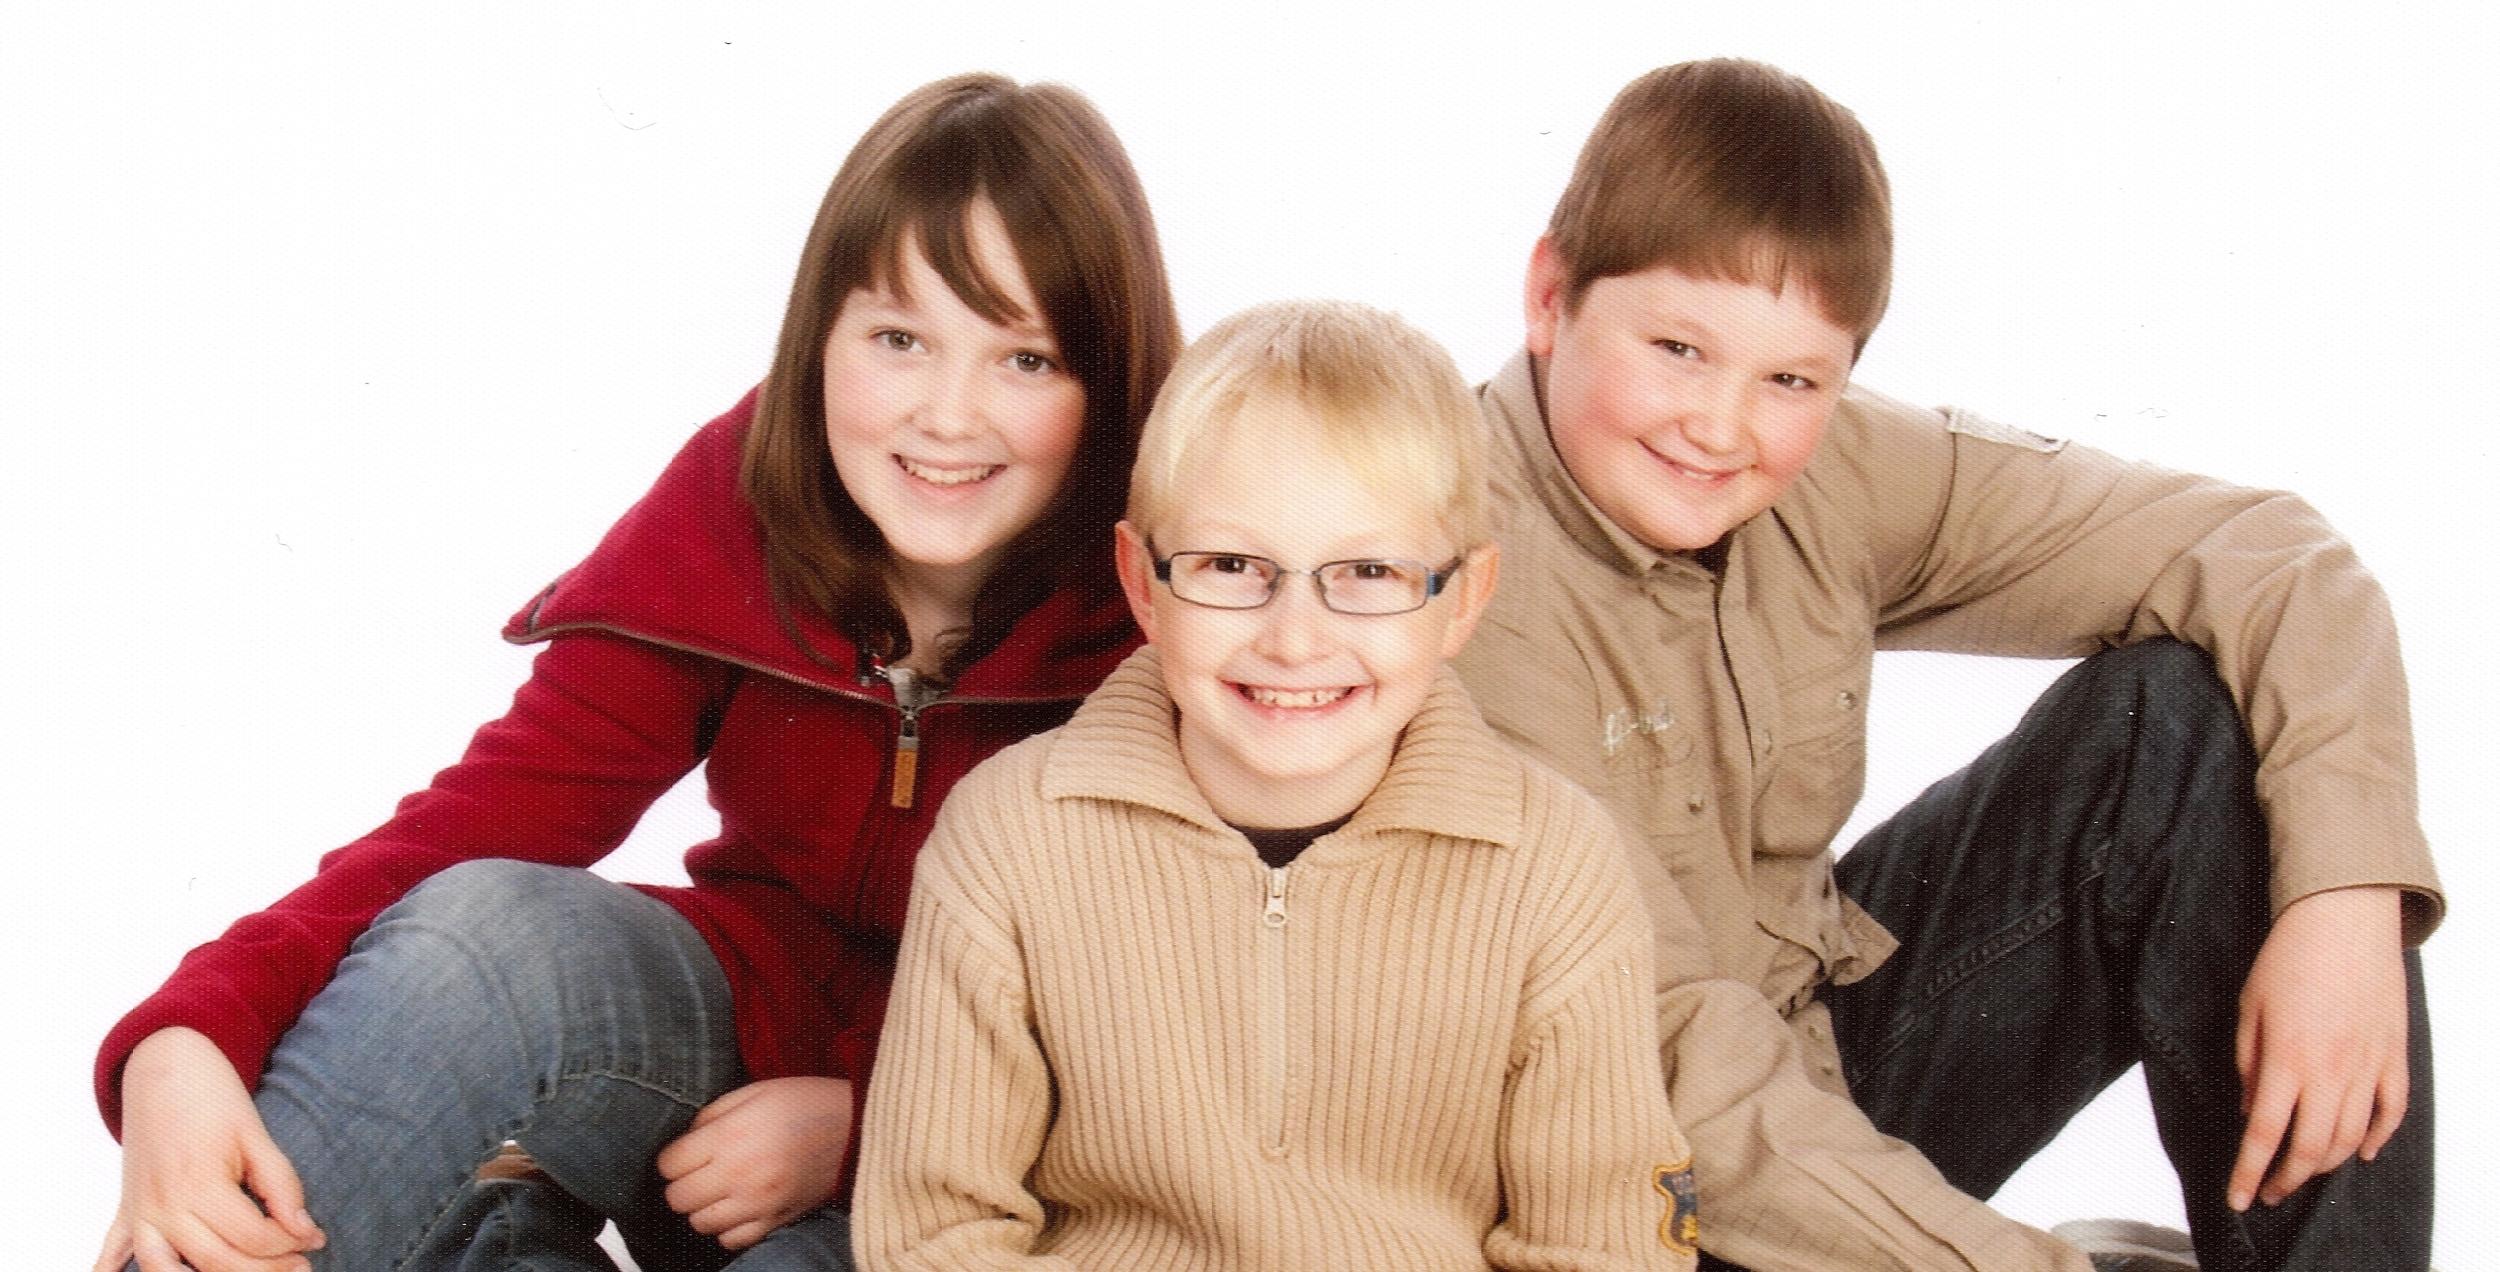 KidsSitting2012Cropped.jpg